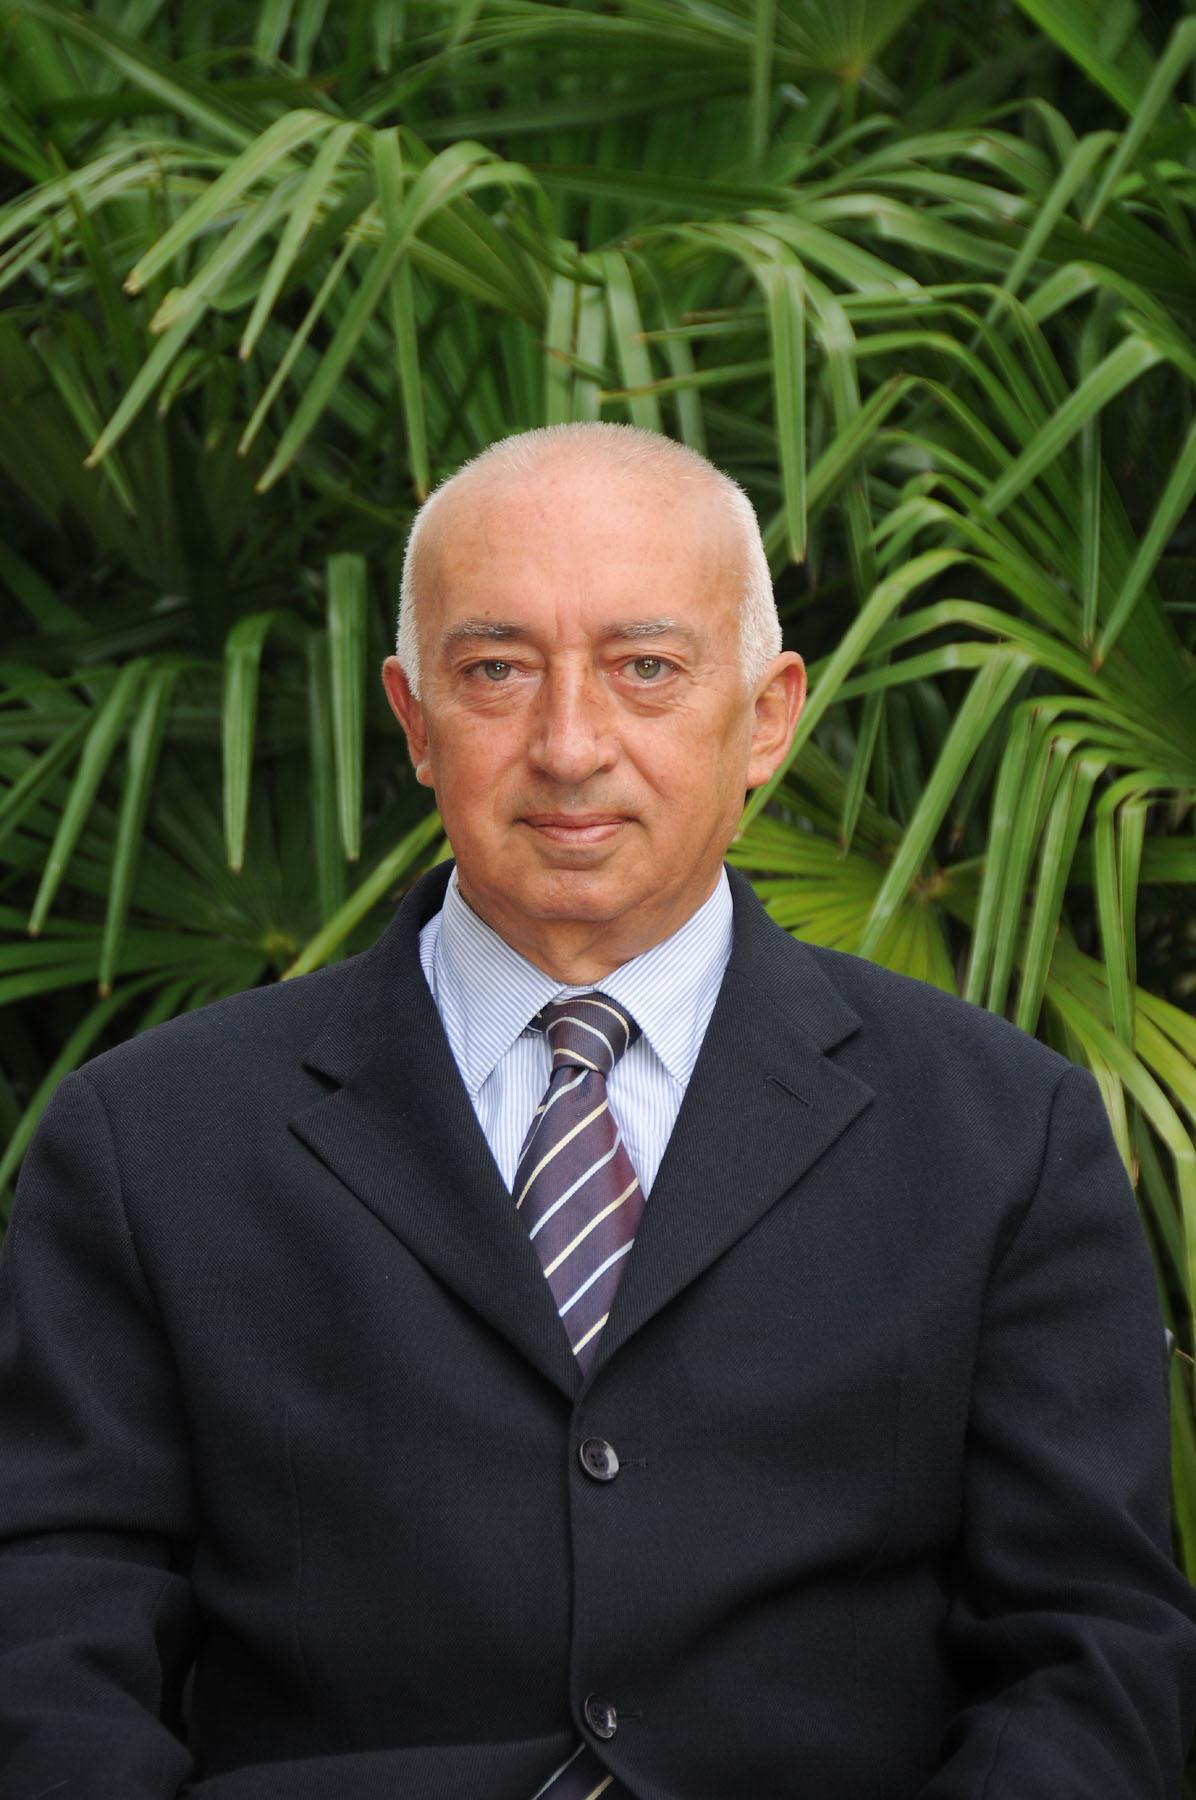 Antonio Alberto Conrater -  Verderio Inferiore